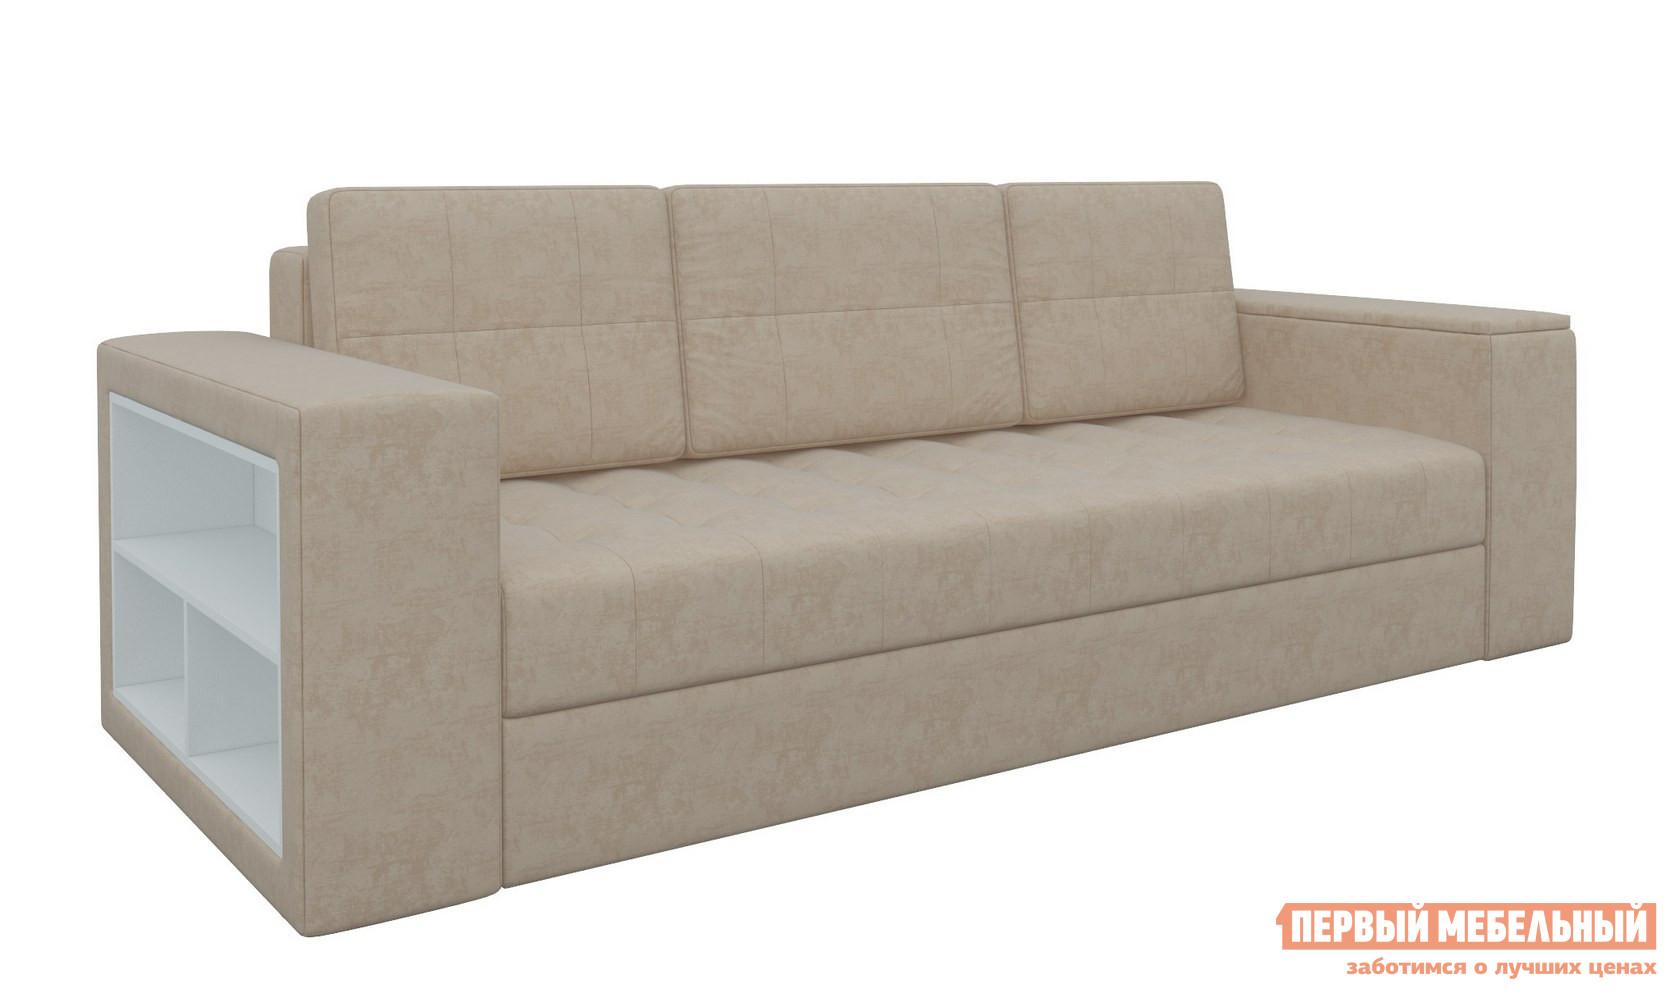 Прямой диван Мебелико Диван-еврокнижка Пазолини